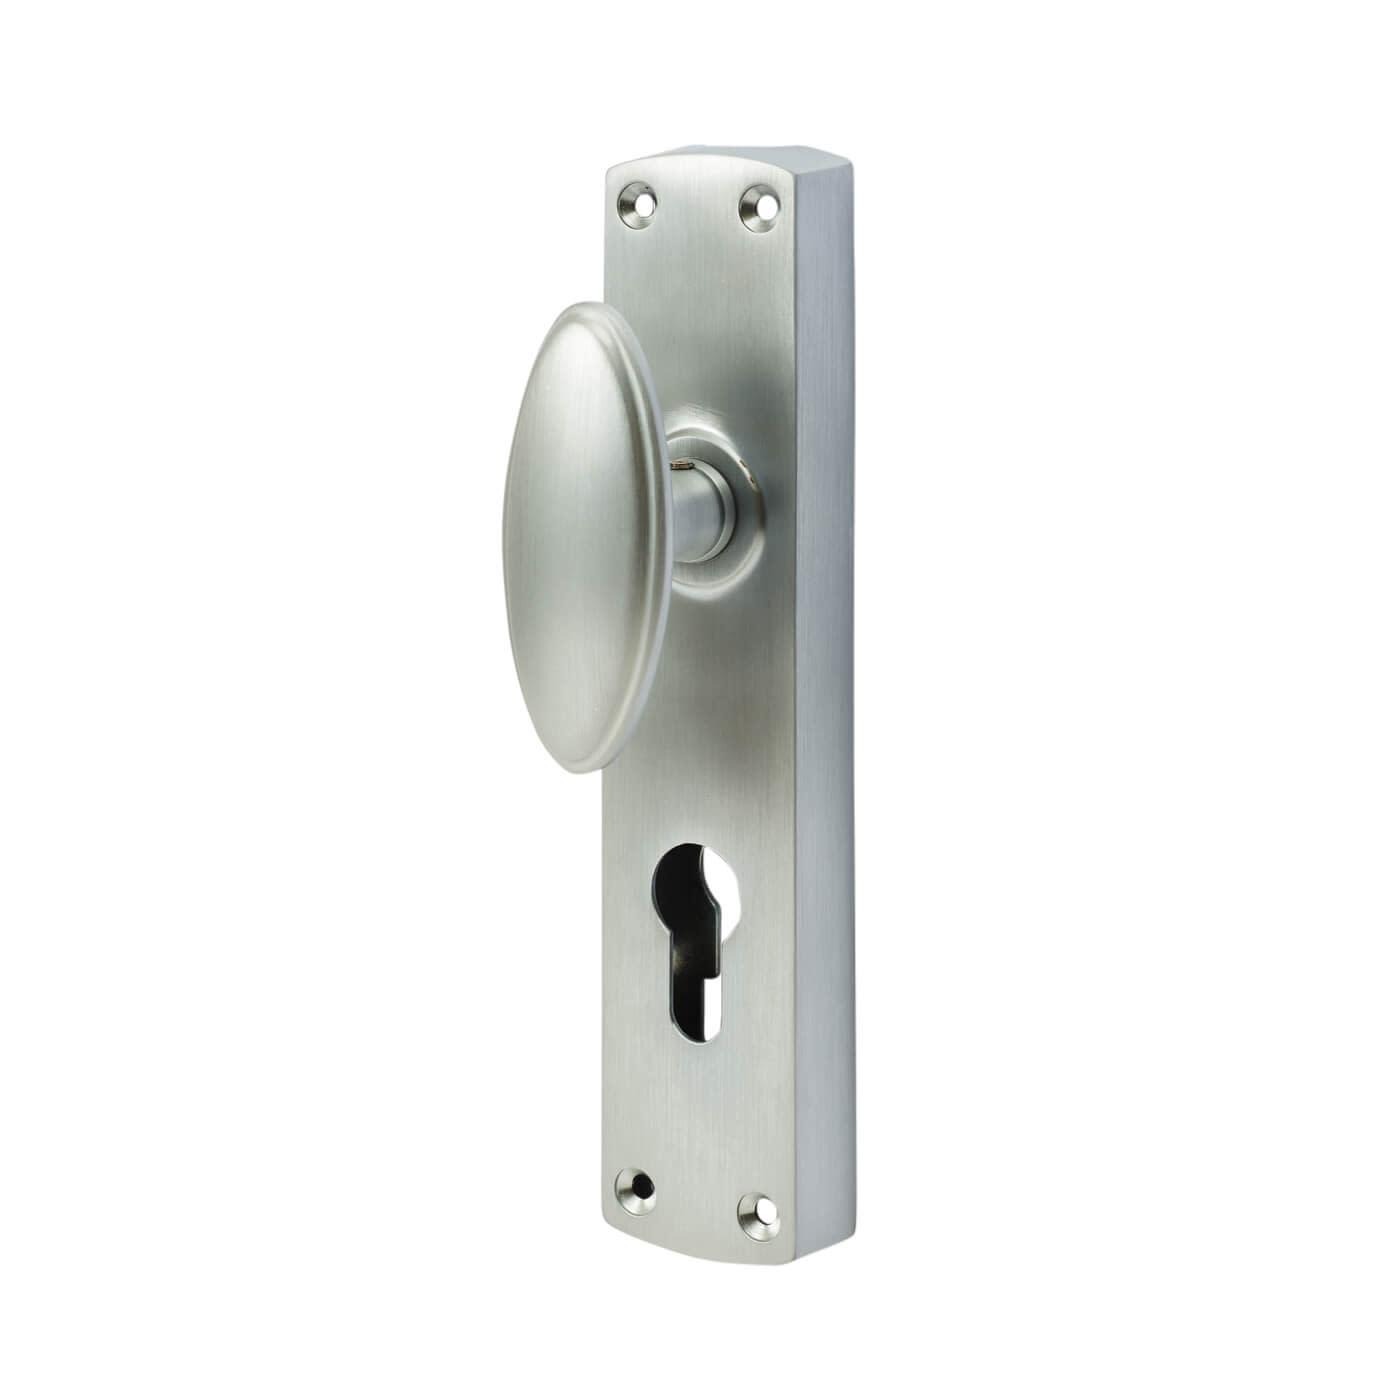 Jedo European Style Locking Espagnolette Bolt - Satin Chrome)